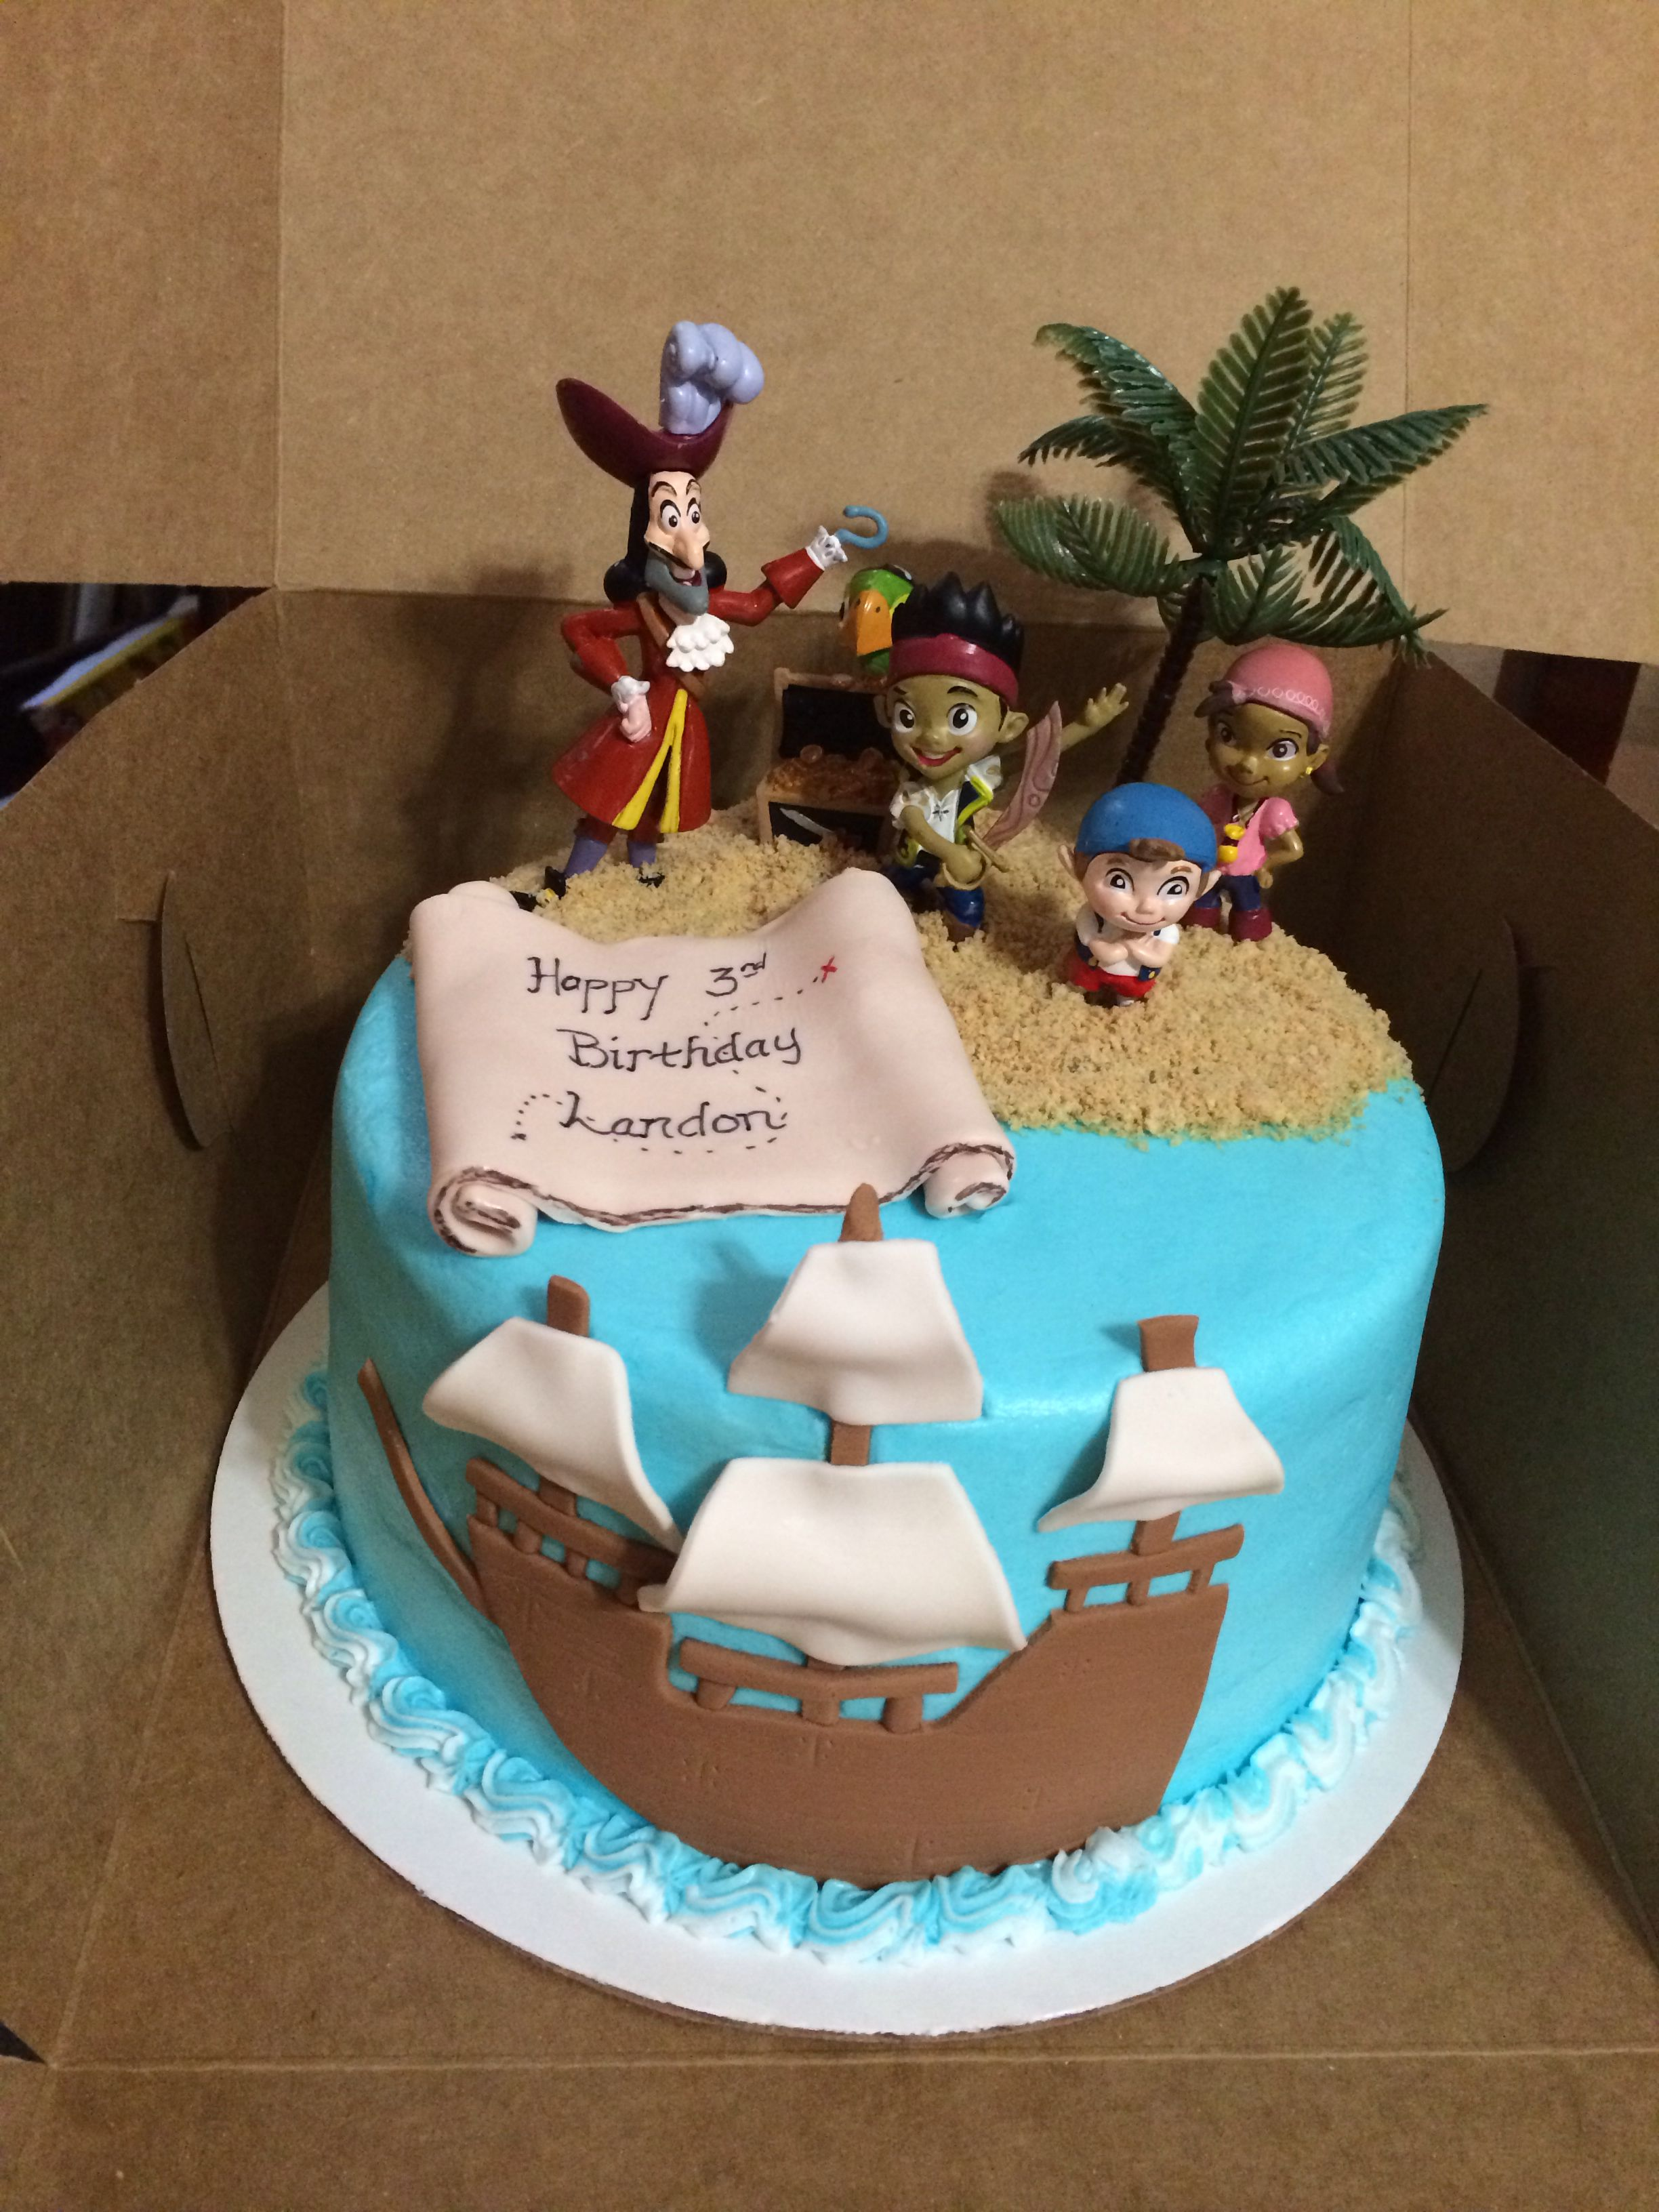 Super Landons Birthday Cake Jake And The Neverland Pirates Cake Personalised Birthday Cards Epsylily Jamesorg